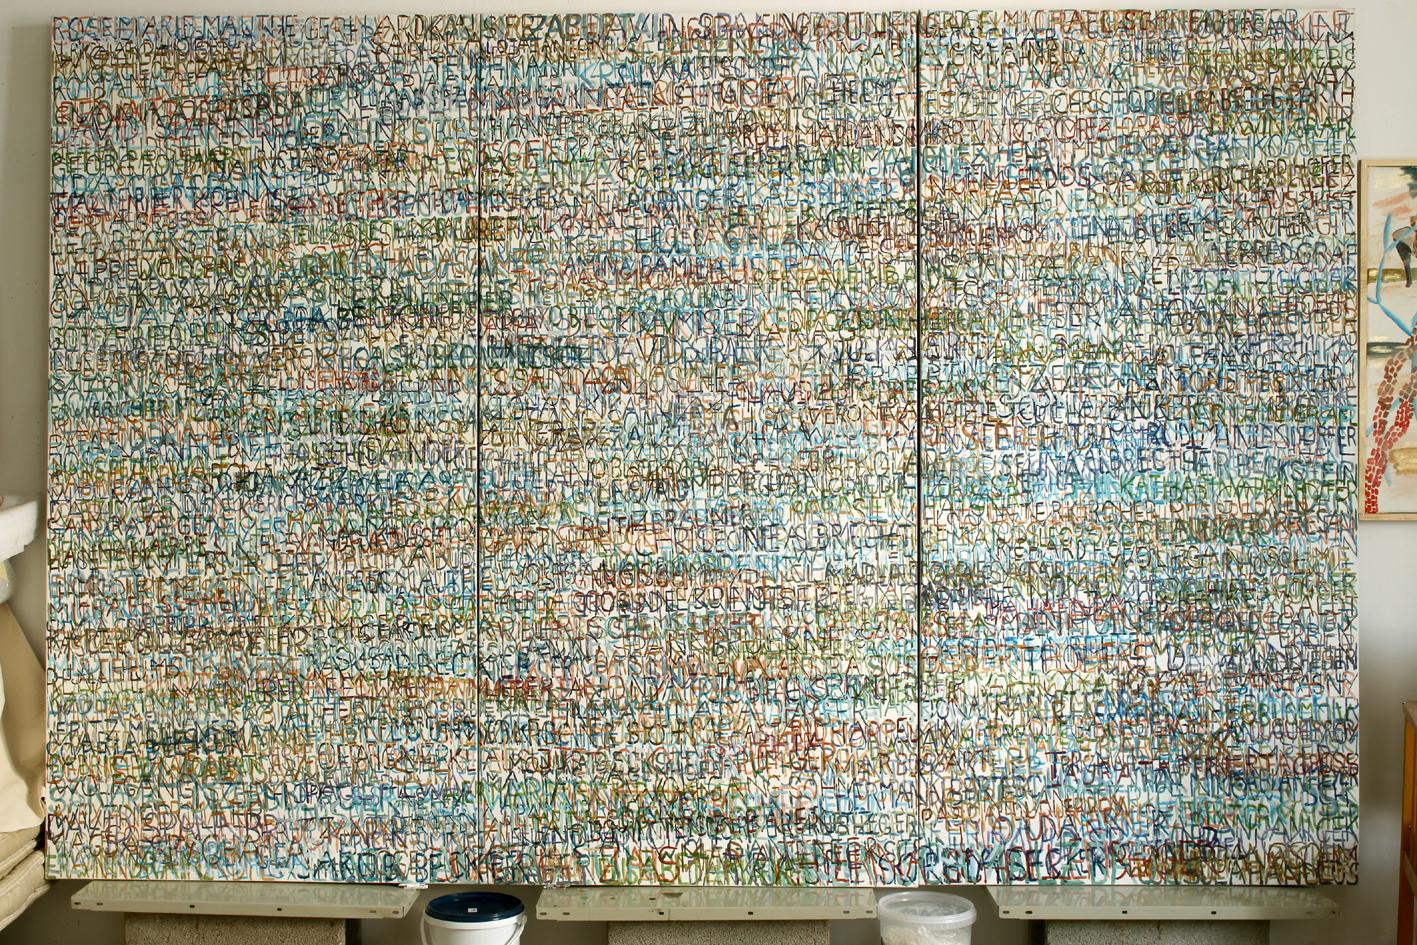 Eva Hradil, FARBaufWEISS, Zustandsbild mit 850 Namen